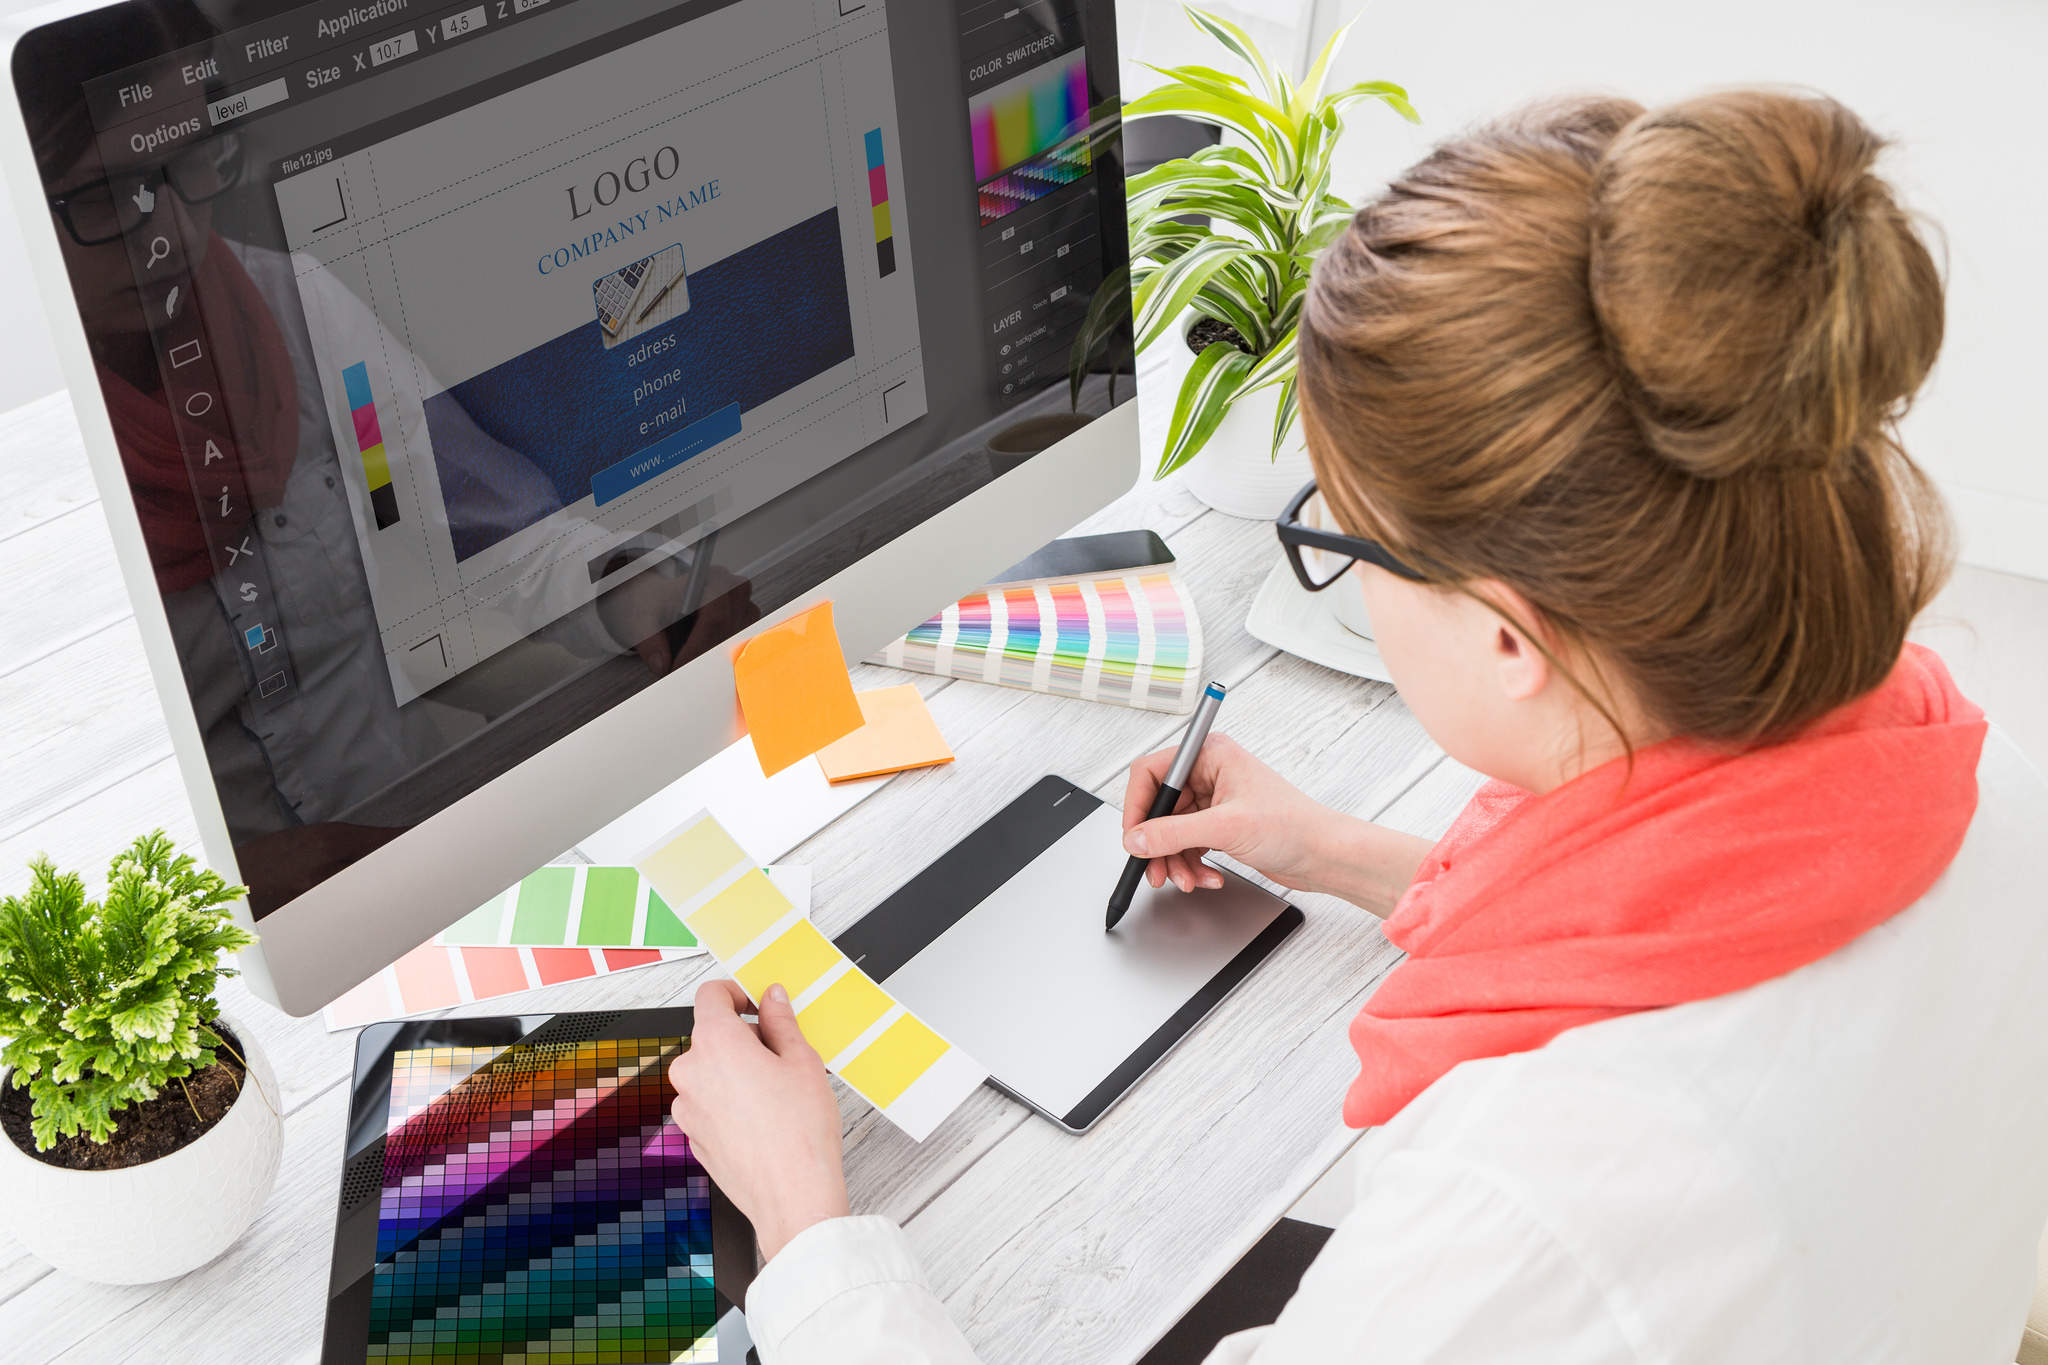 New apprenticeships, graphic designer